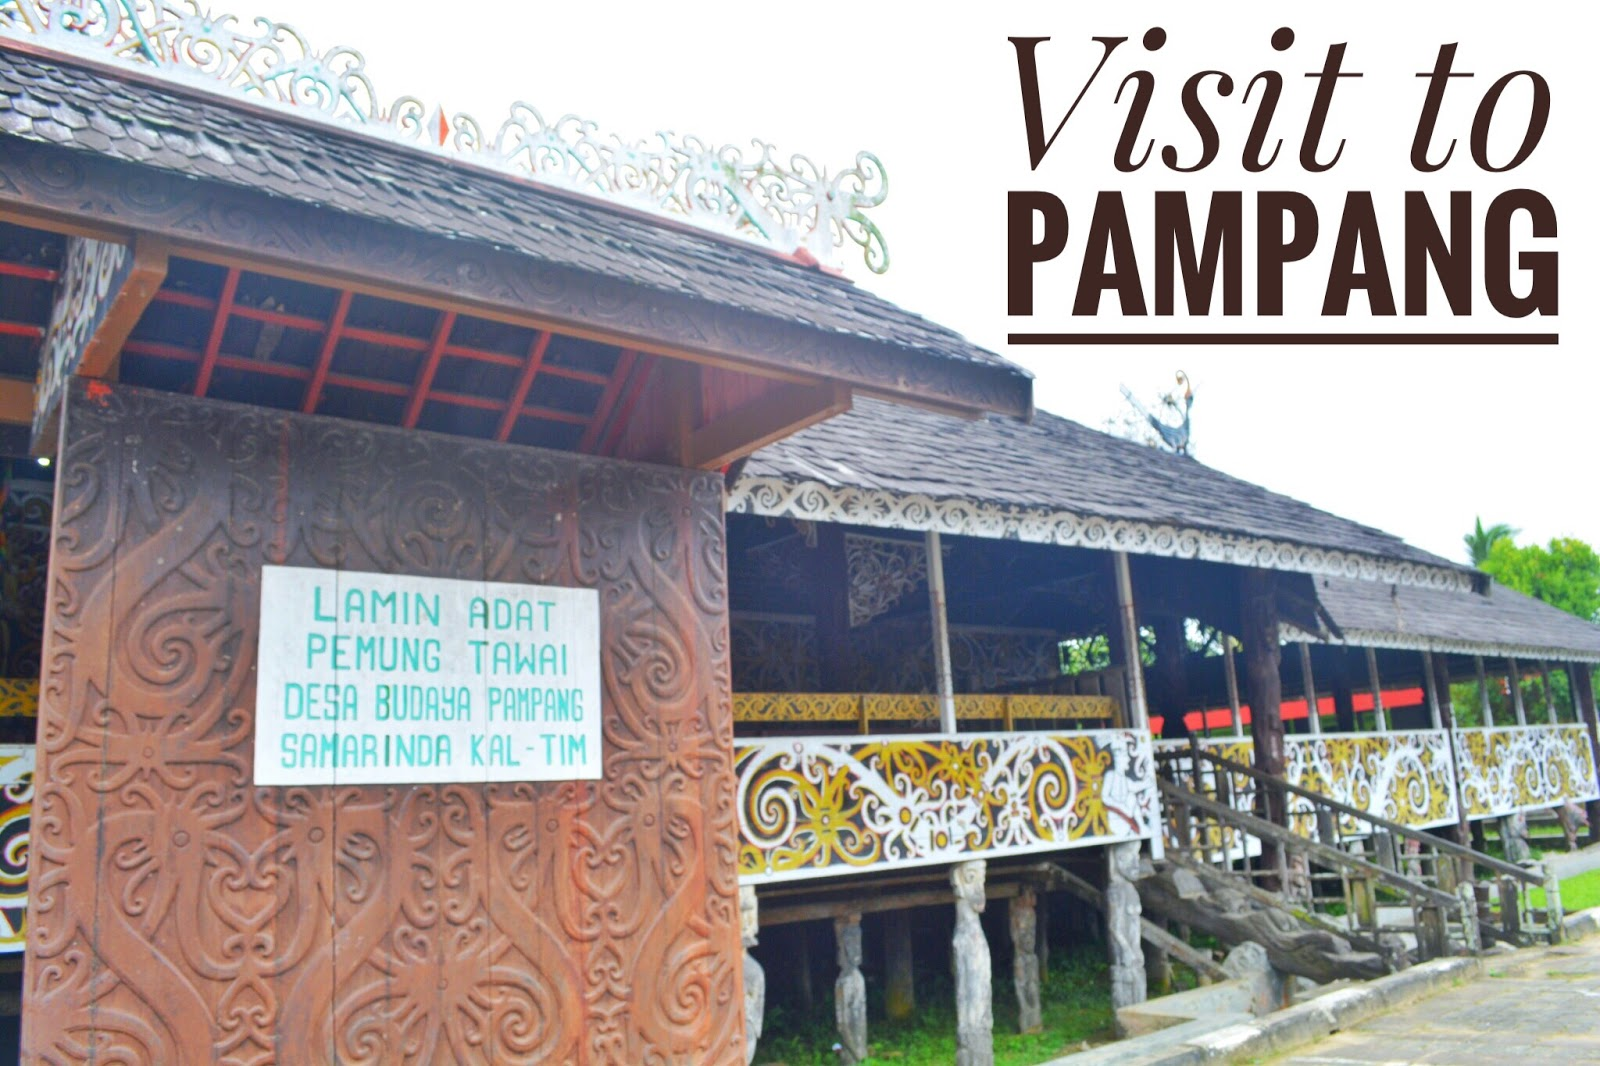 Pampang Desa Budaya Dayak Rizka Amalia Windriani Pulkam Bersama Menjelajah